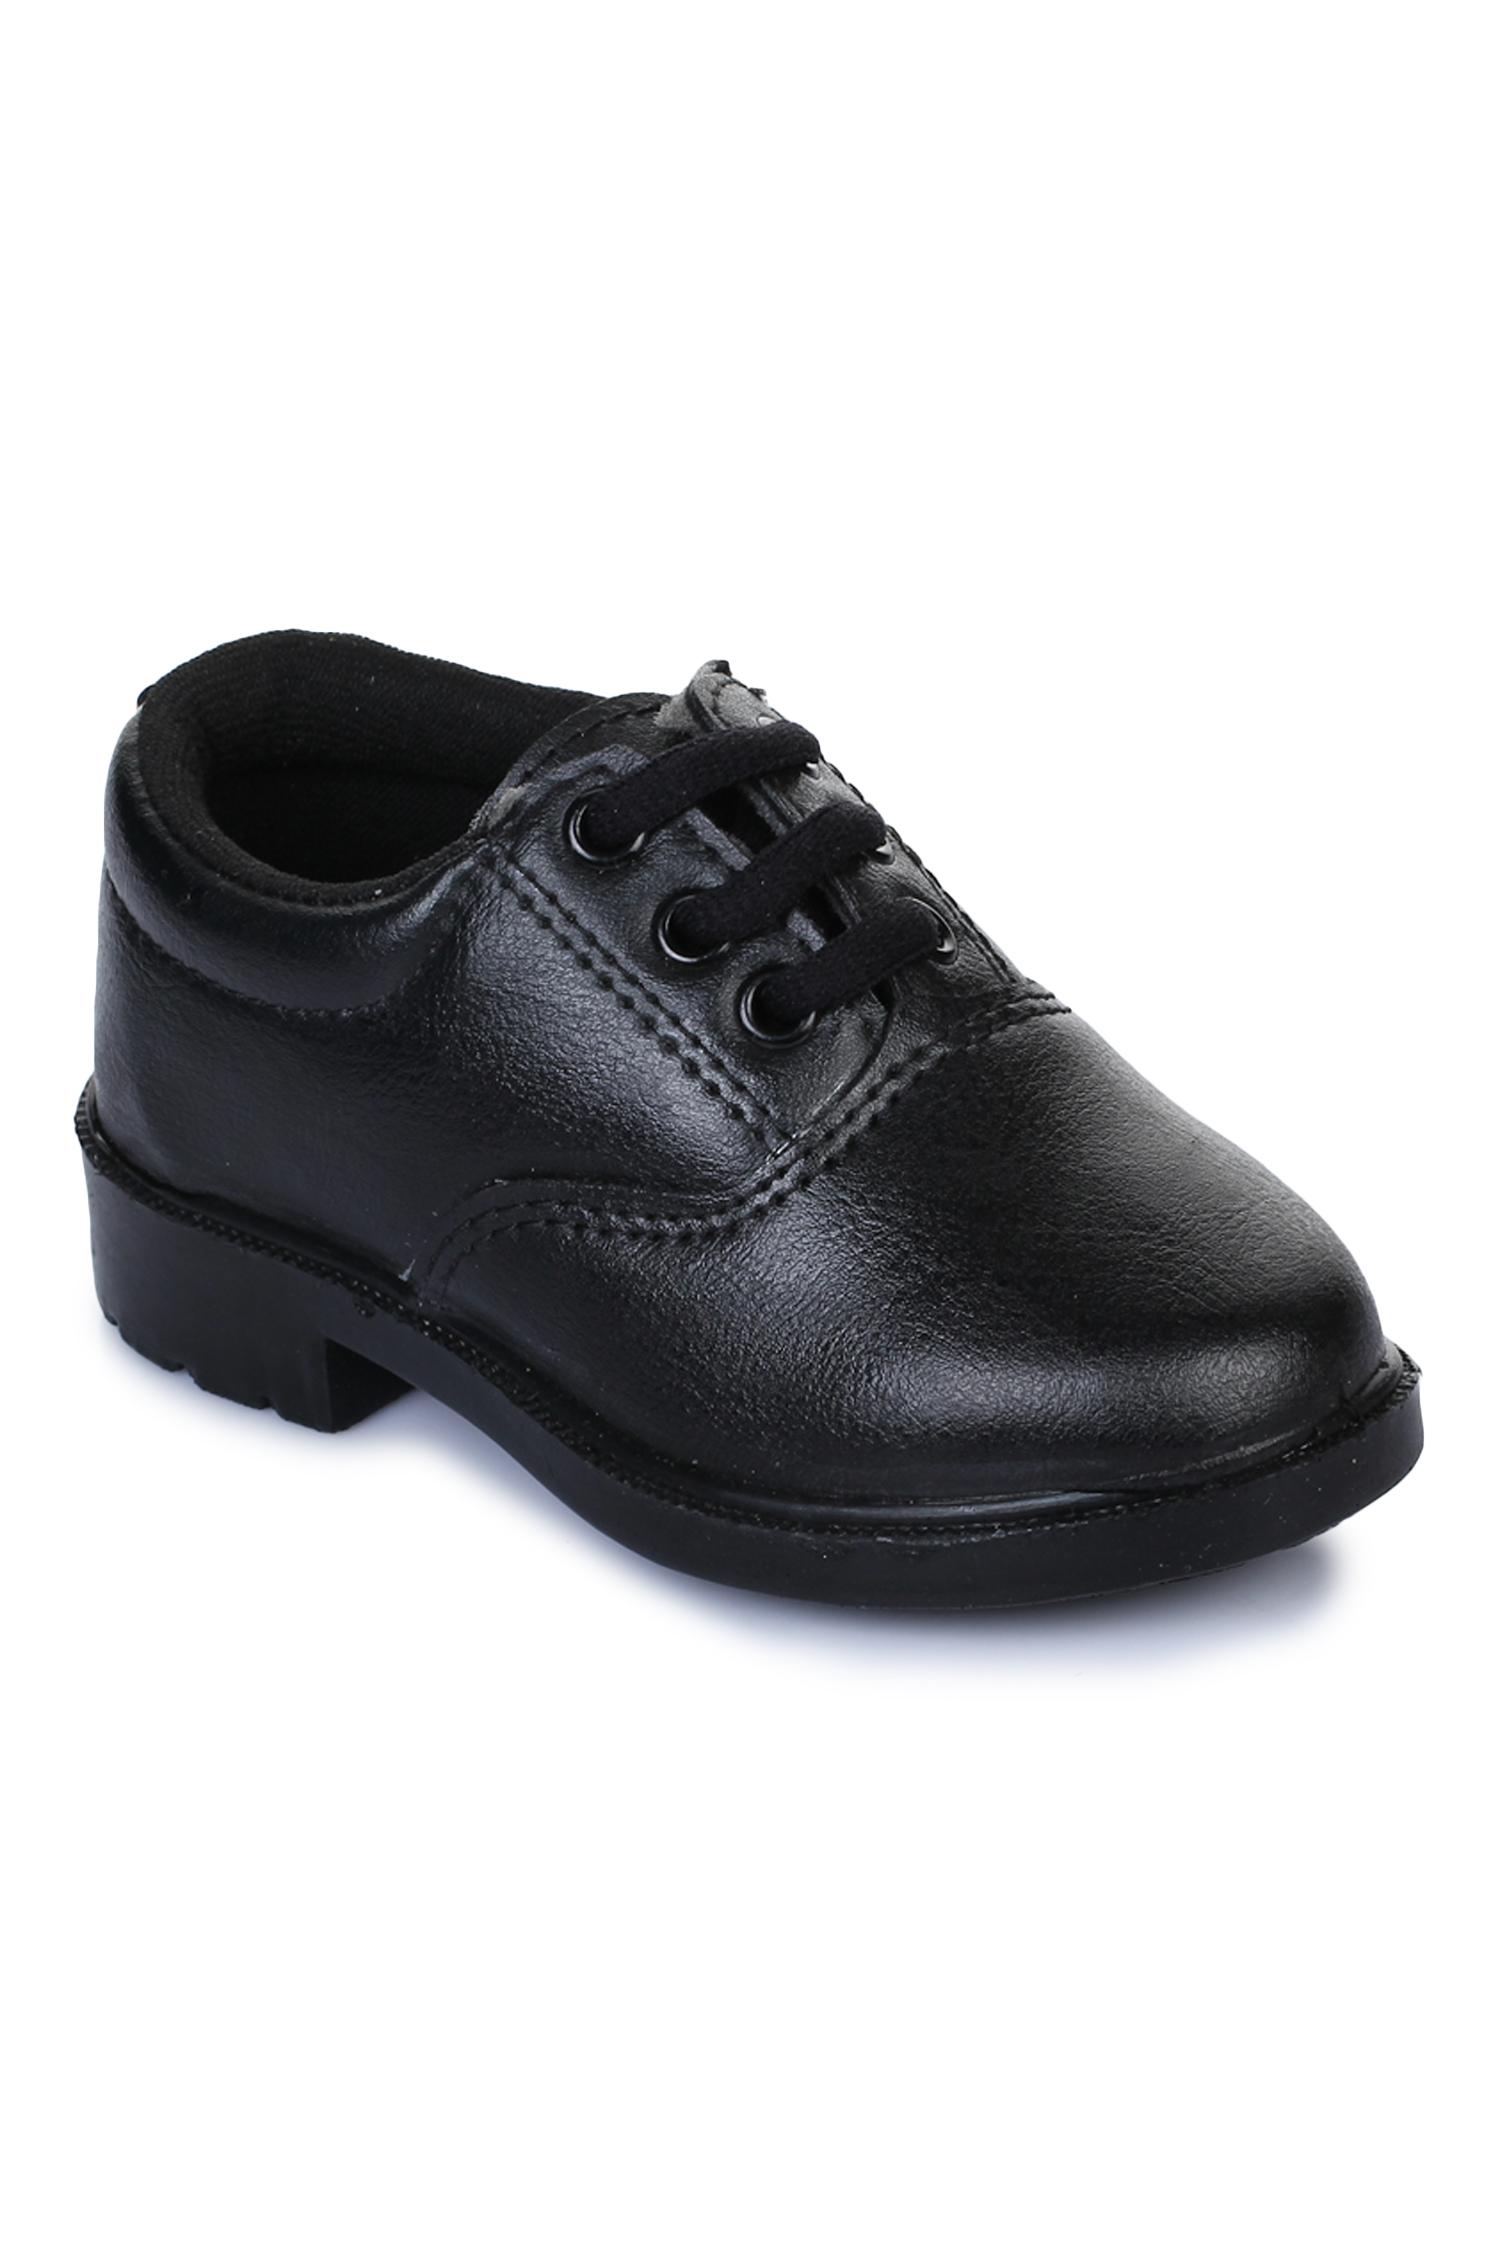 Liberty   Liberty Prefect Black School Shoes SKOOLBOYPU_Black For - Men